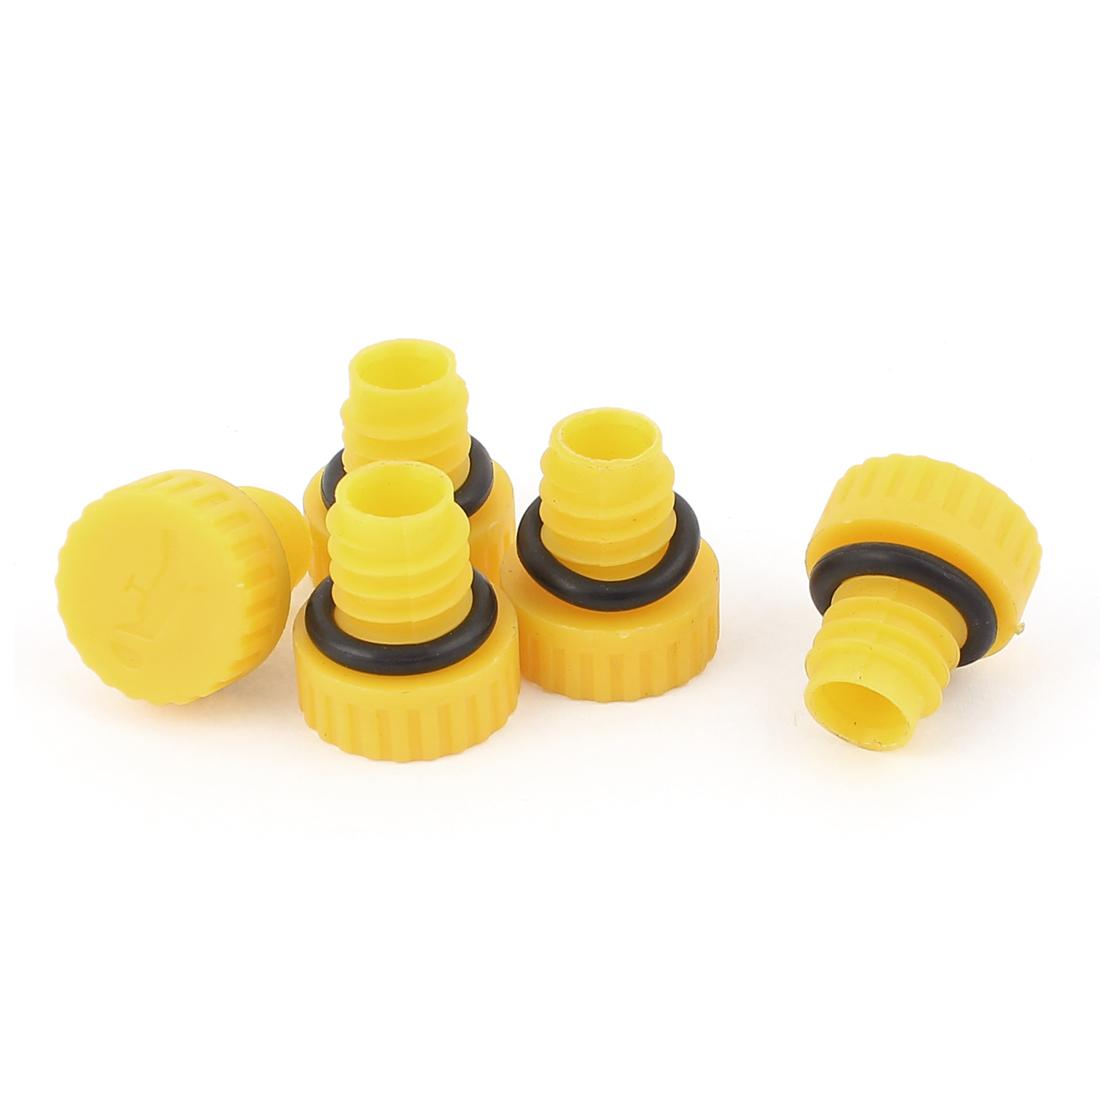 "Air Compressor Rubber Gasket Oil 0.4"" Thread Diameter Yellow Black 5 Pcs"